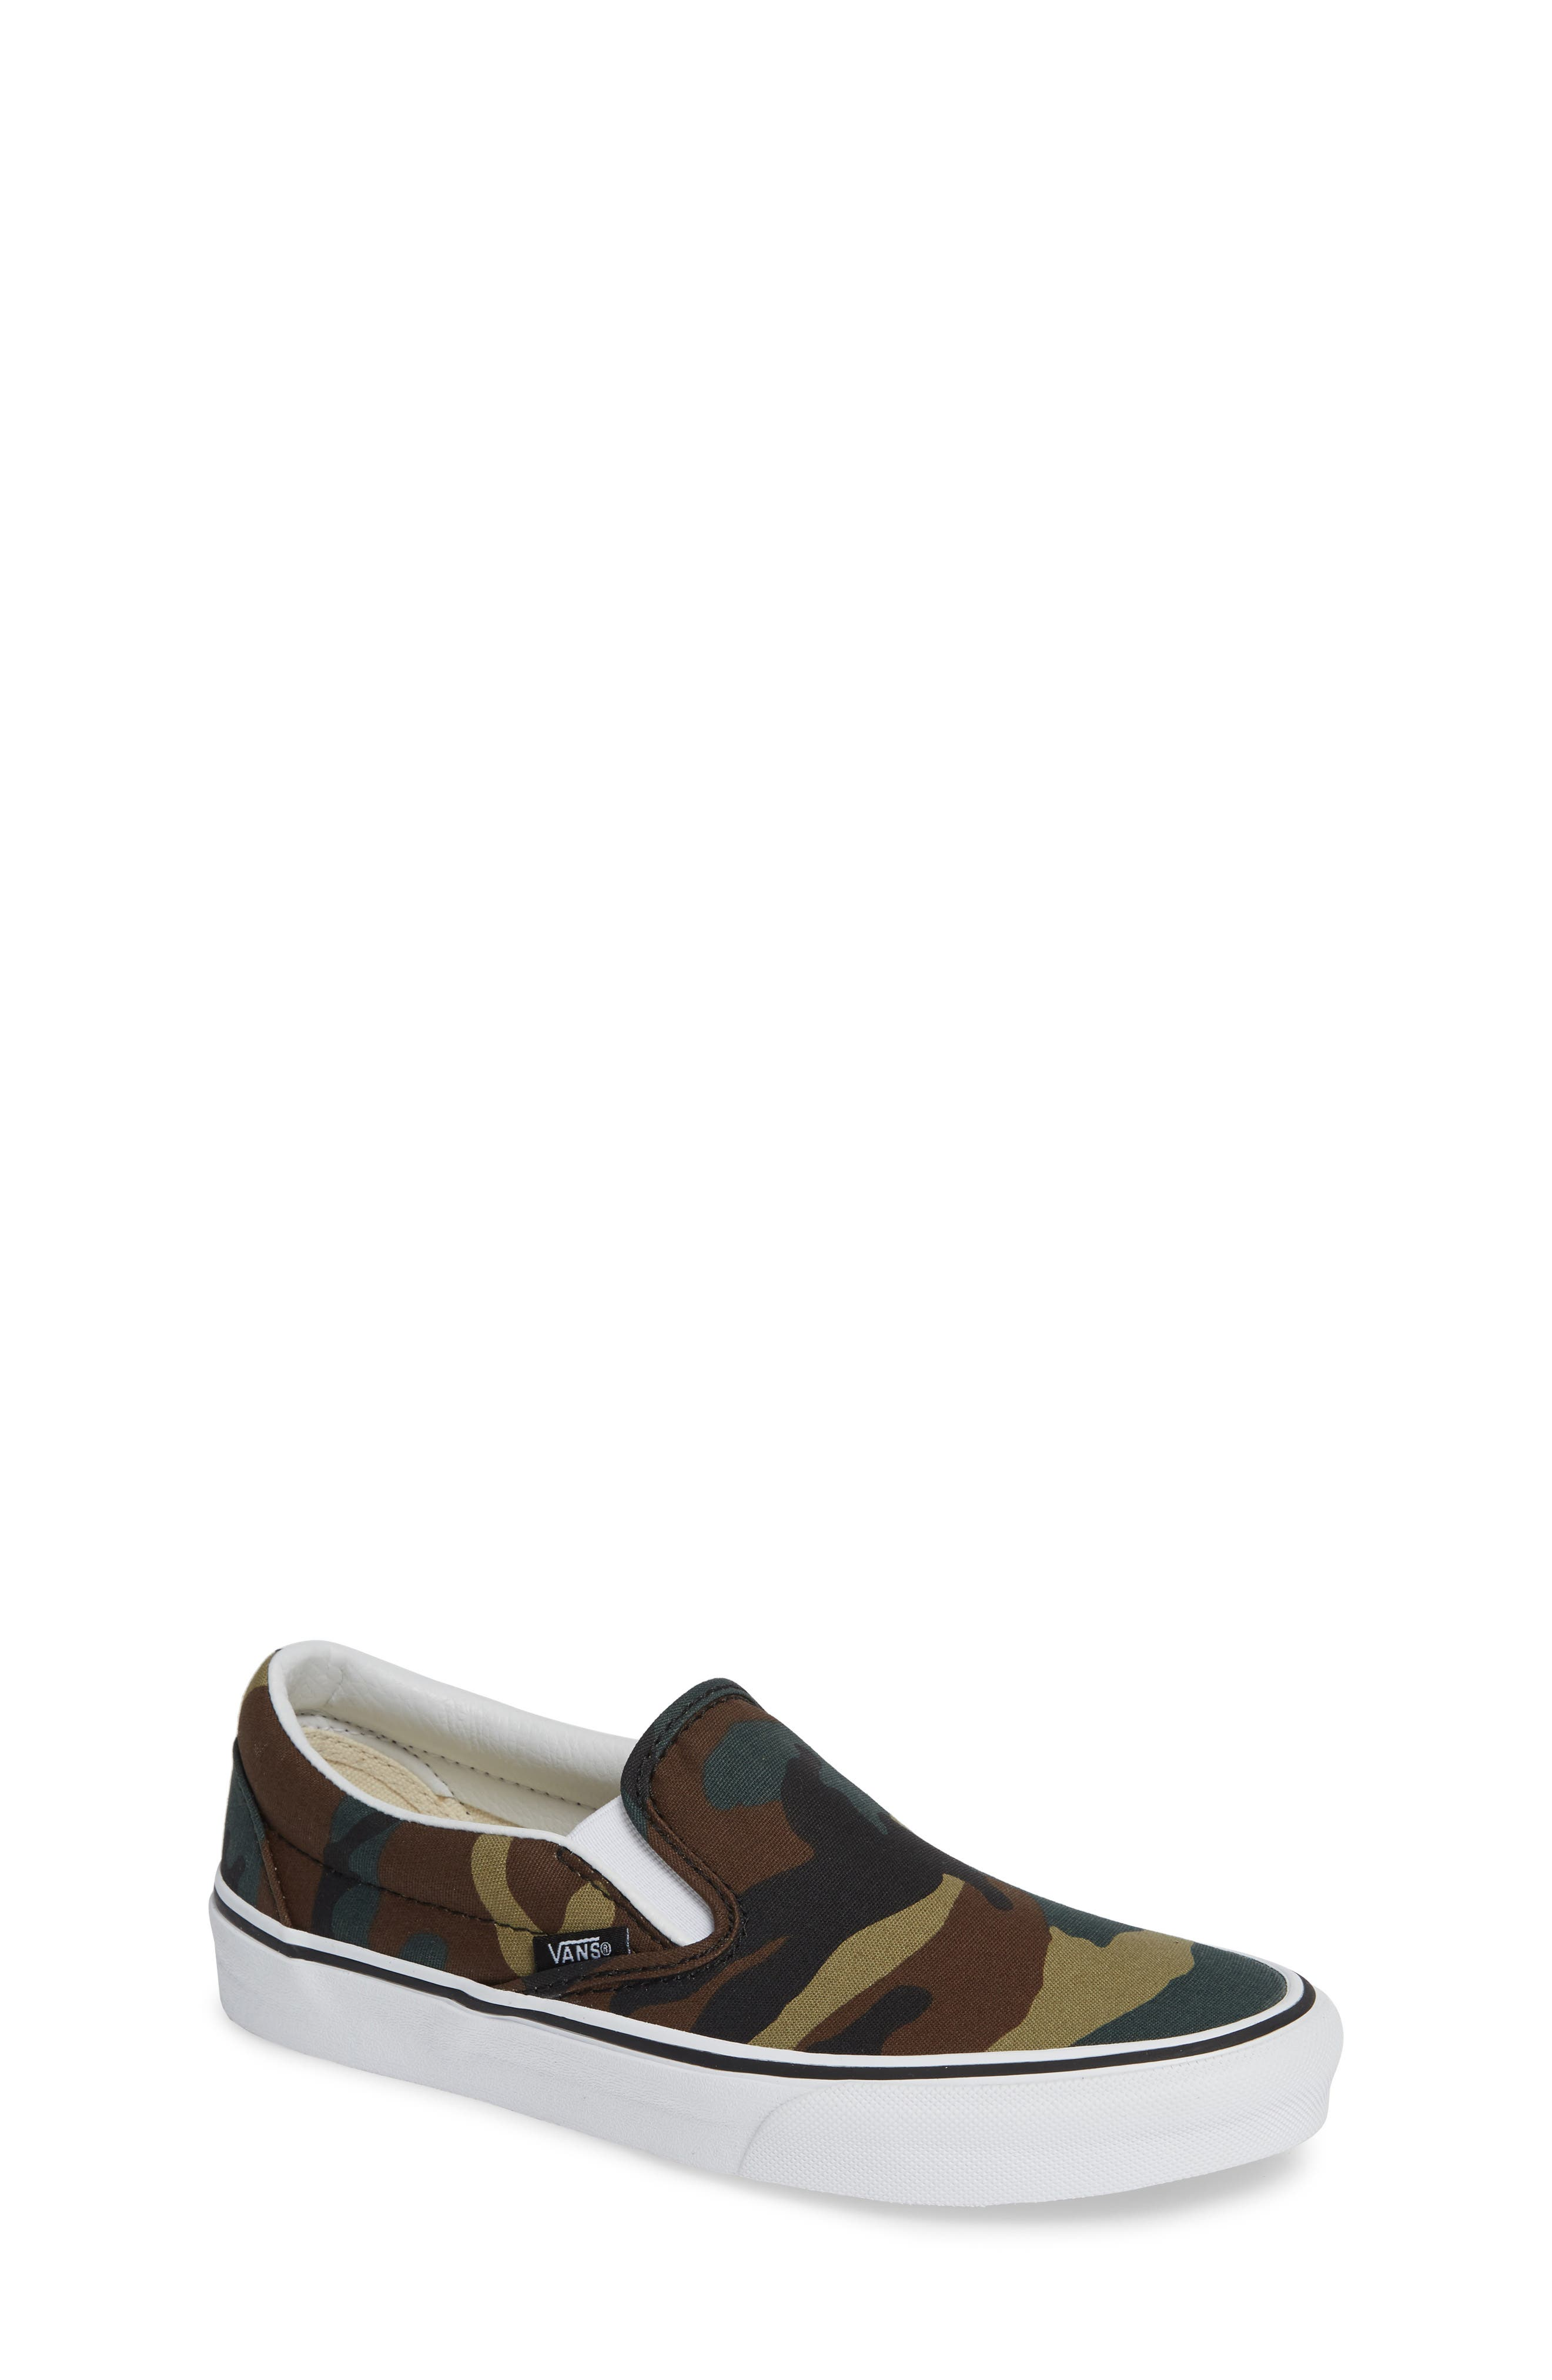 Classic Slip-On Sneaker,                             Main thumbnail 1, color,                             001